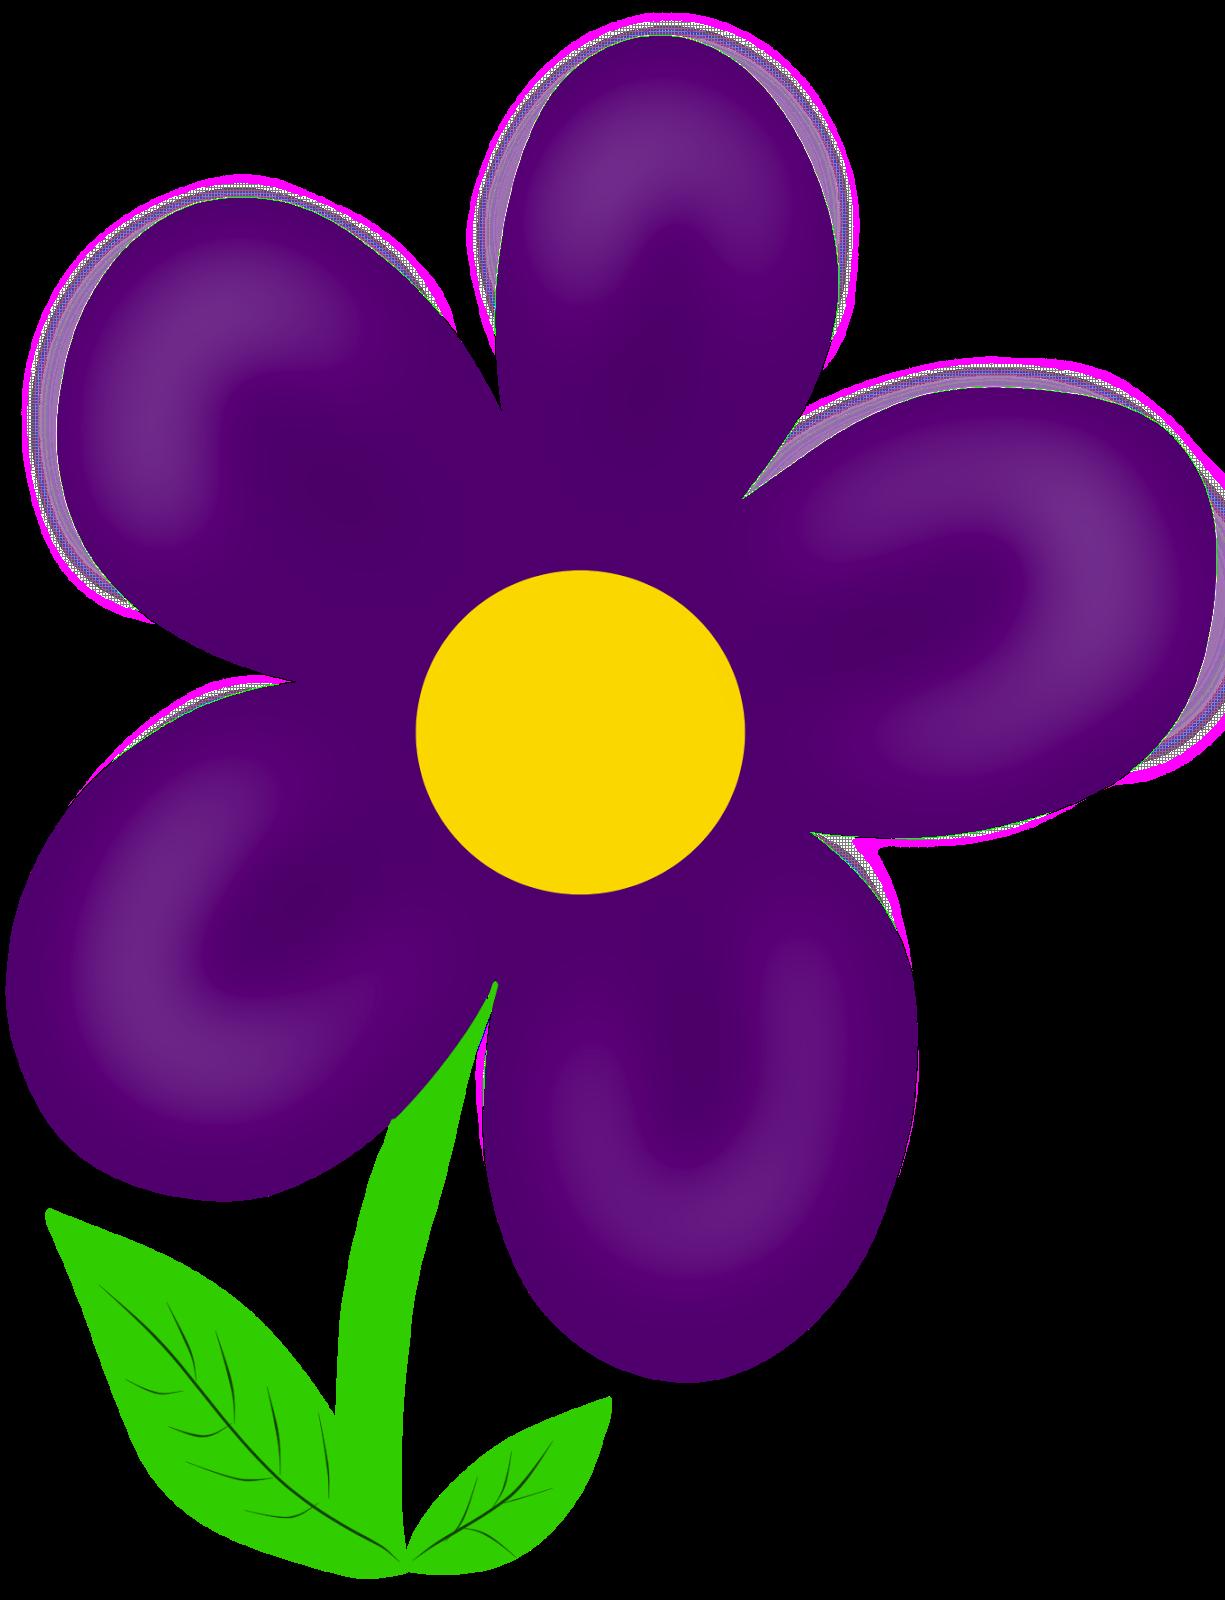 1225x1600 Top 81 Flowers Clip Art